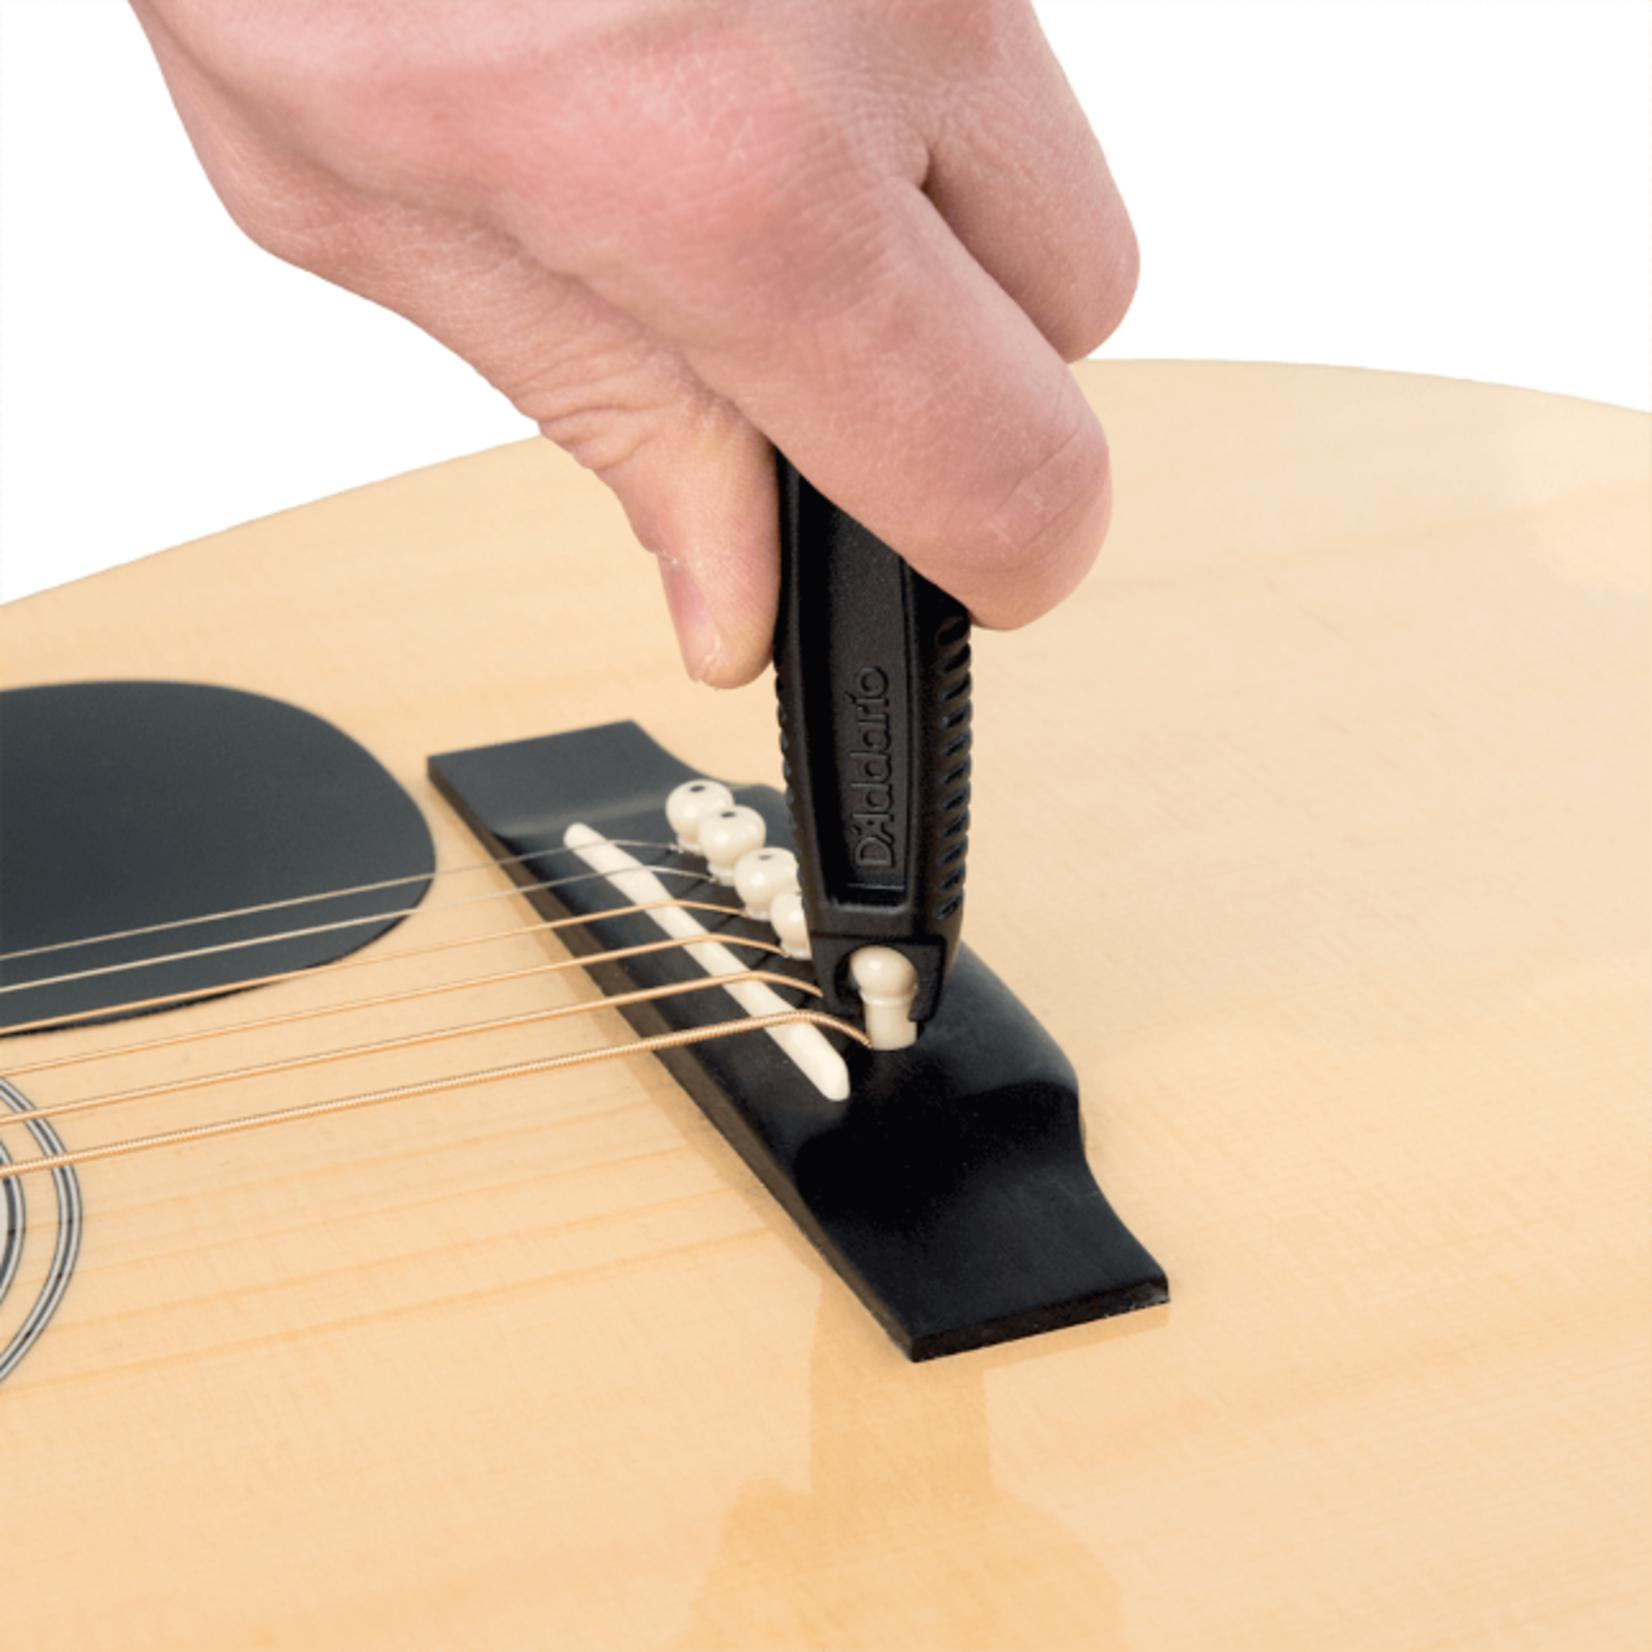 D'Addario D'Addario Pro-Winder String Winder and Cutter (Guitar)